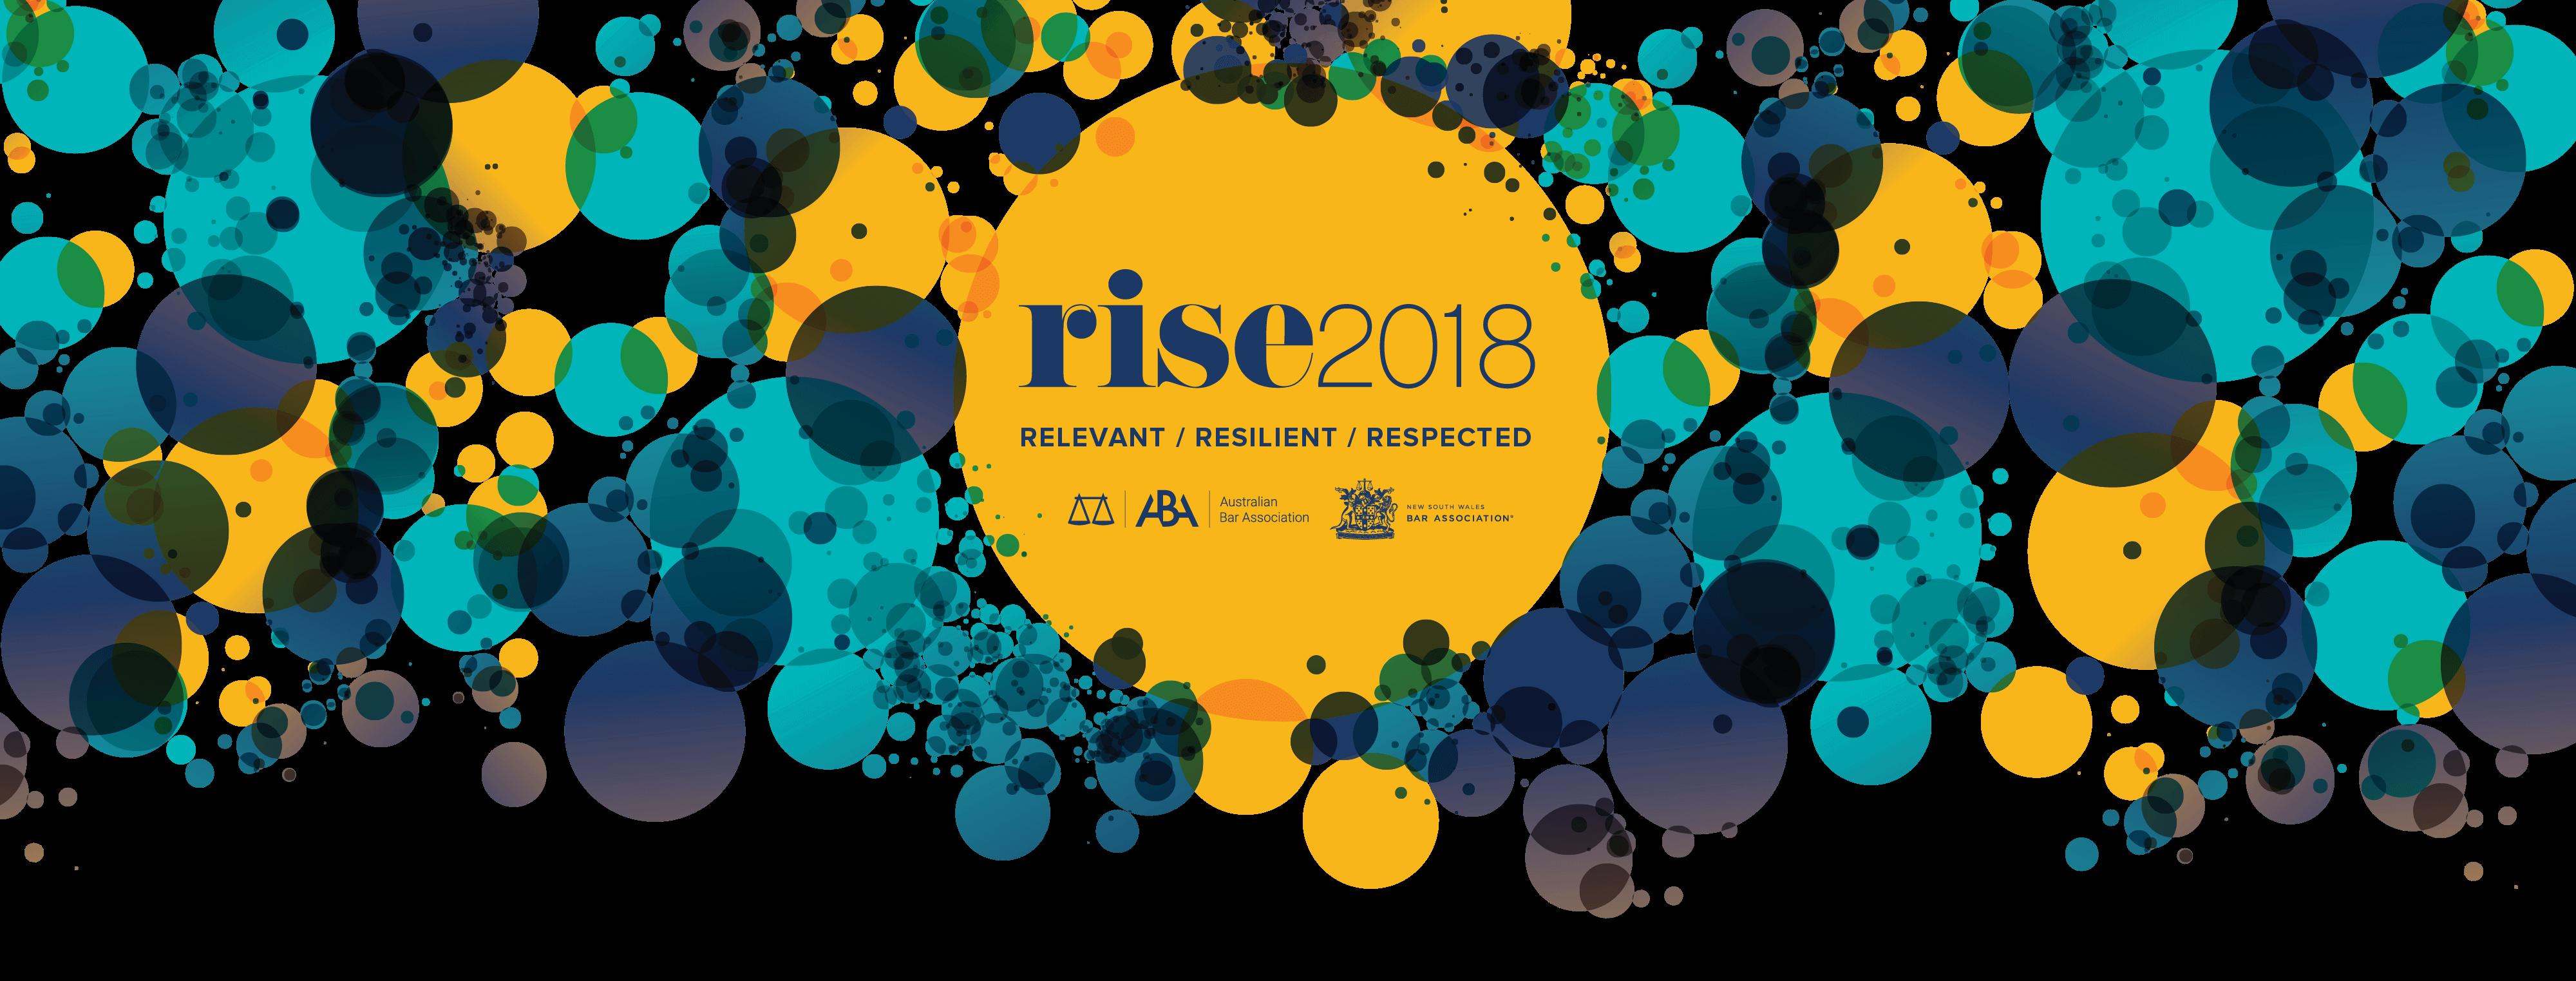 Rise2018-IMFBentham